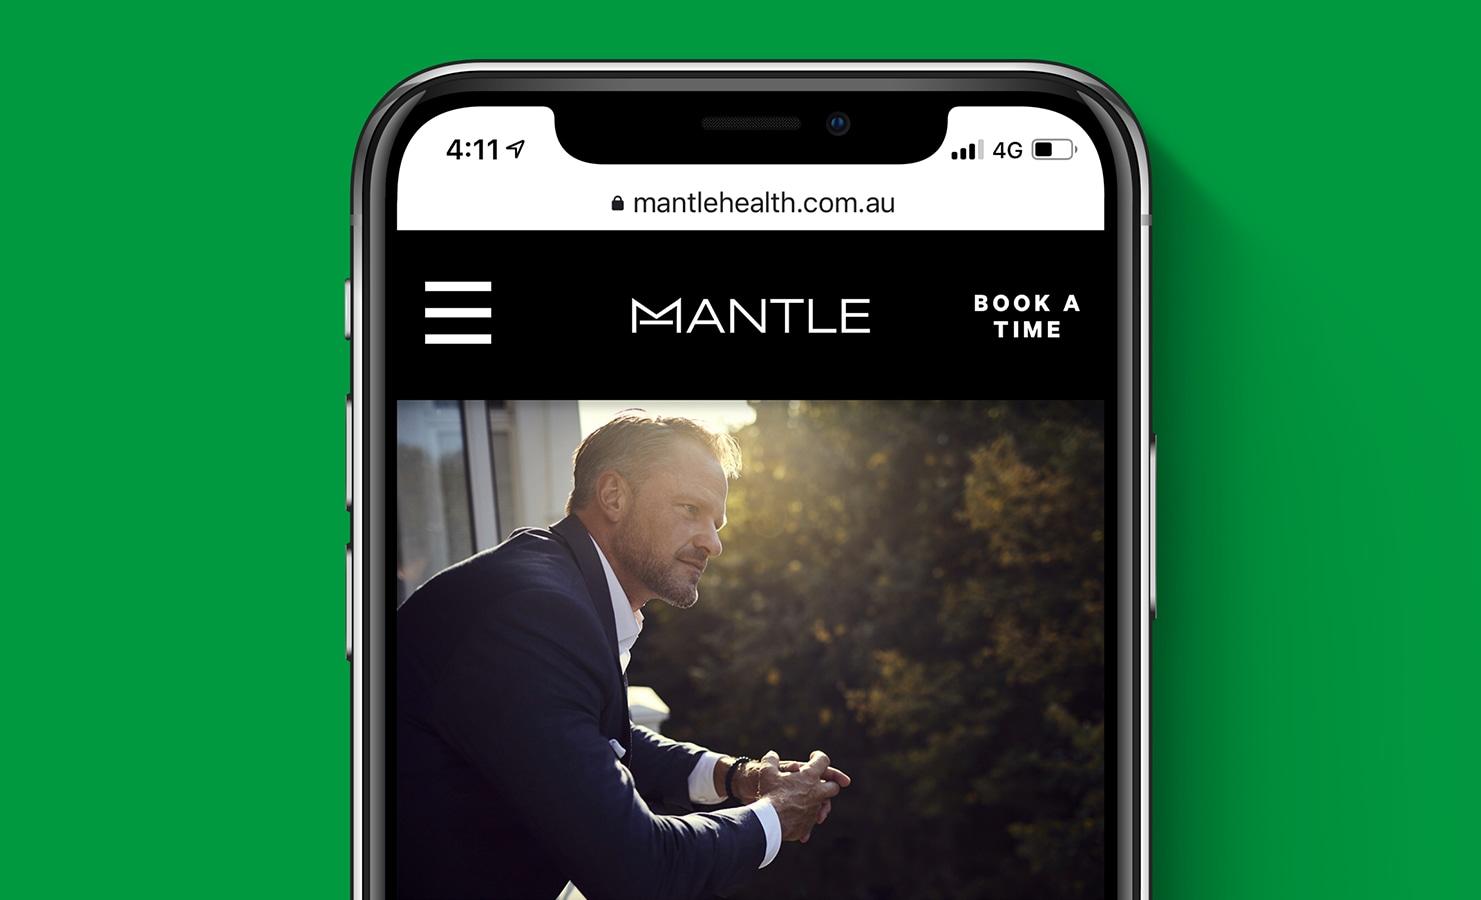 mantlehealth.com.au on a mobile device